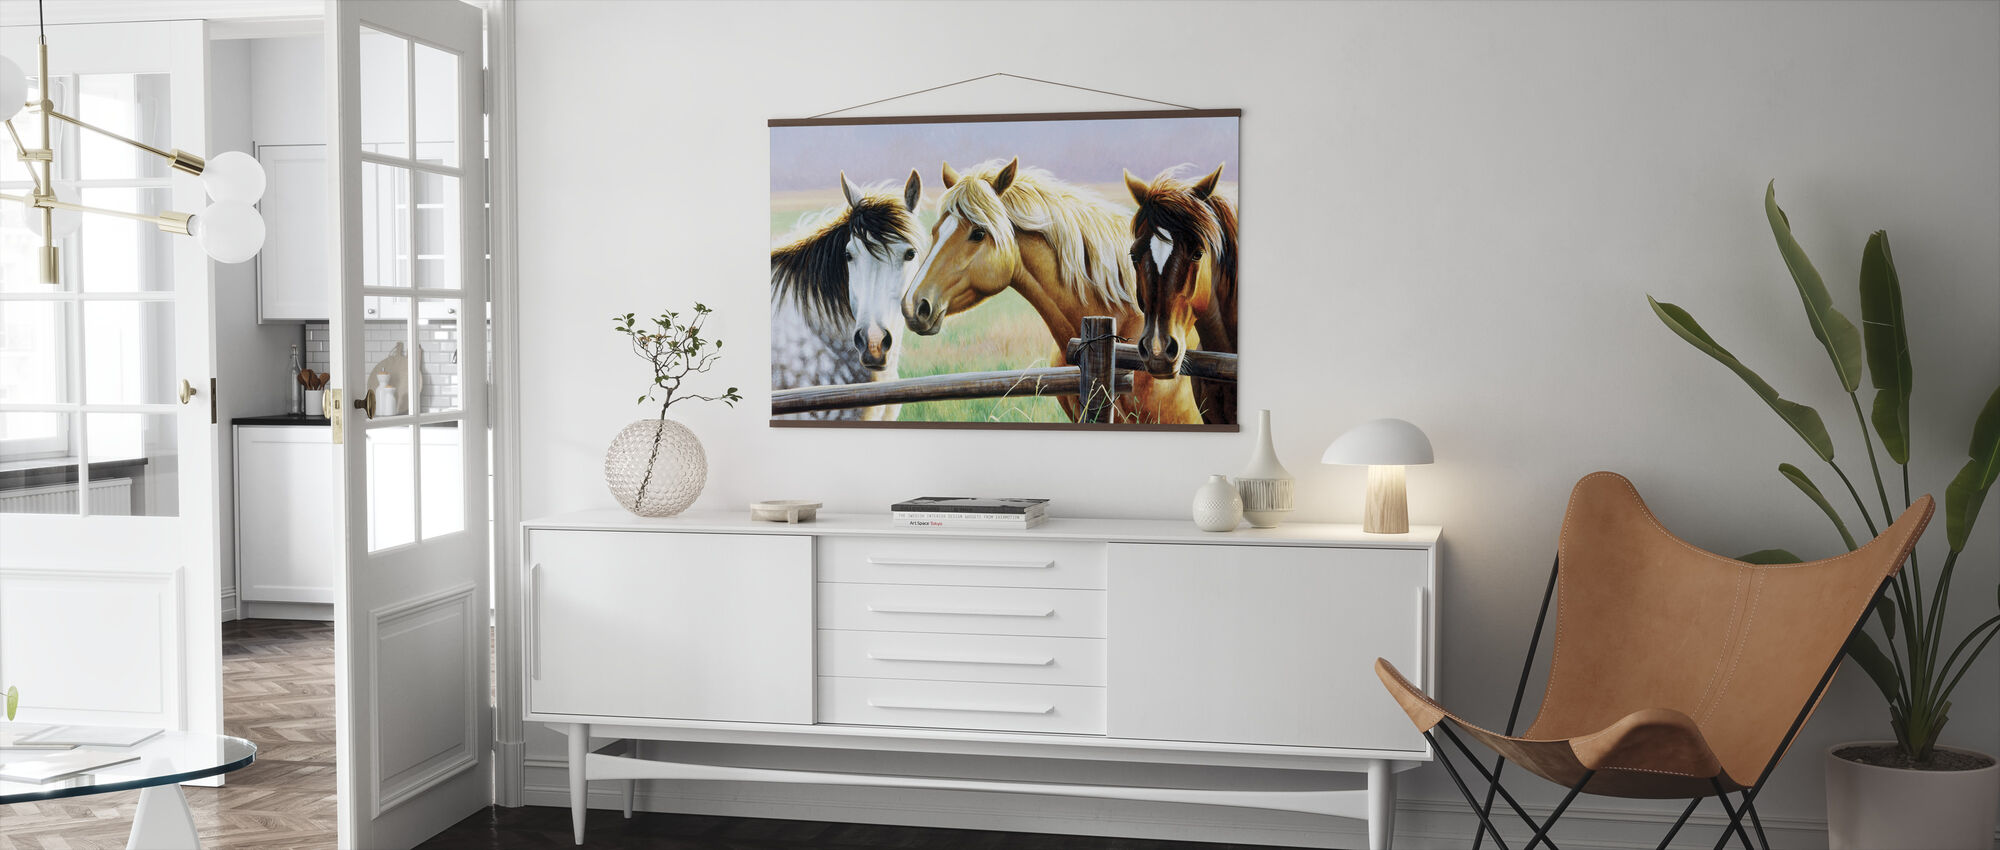 Tres caballos en la valla - Póster - Salón